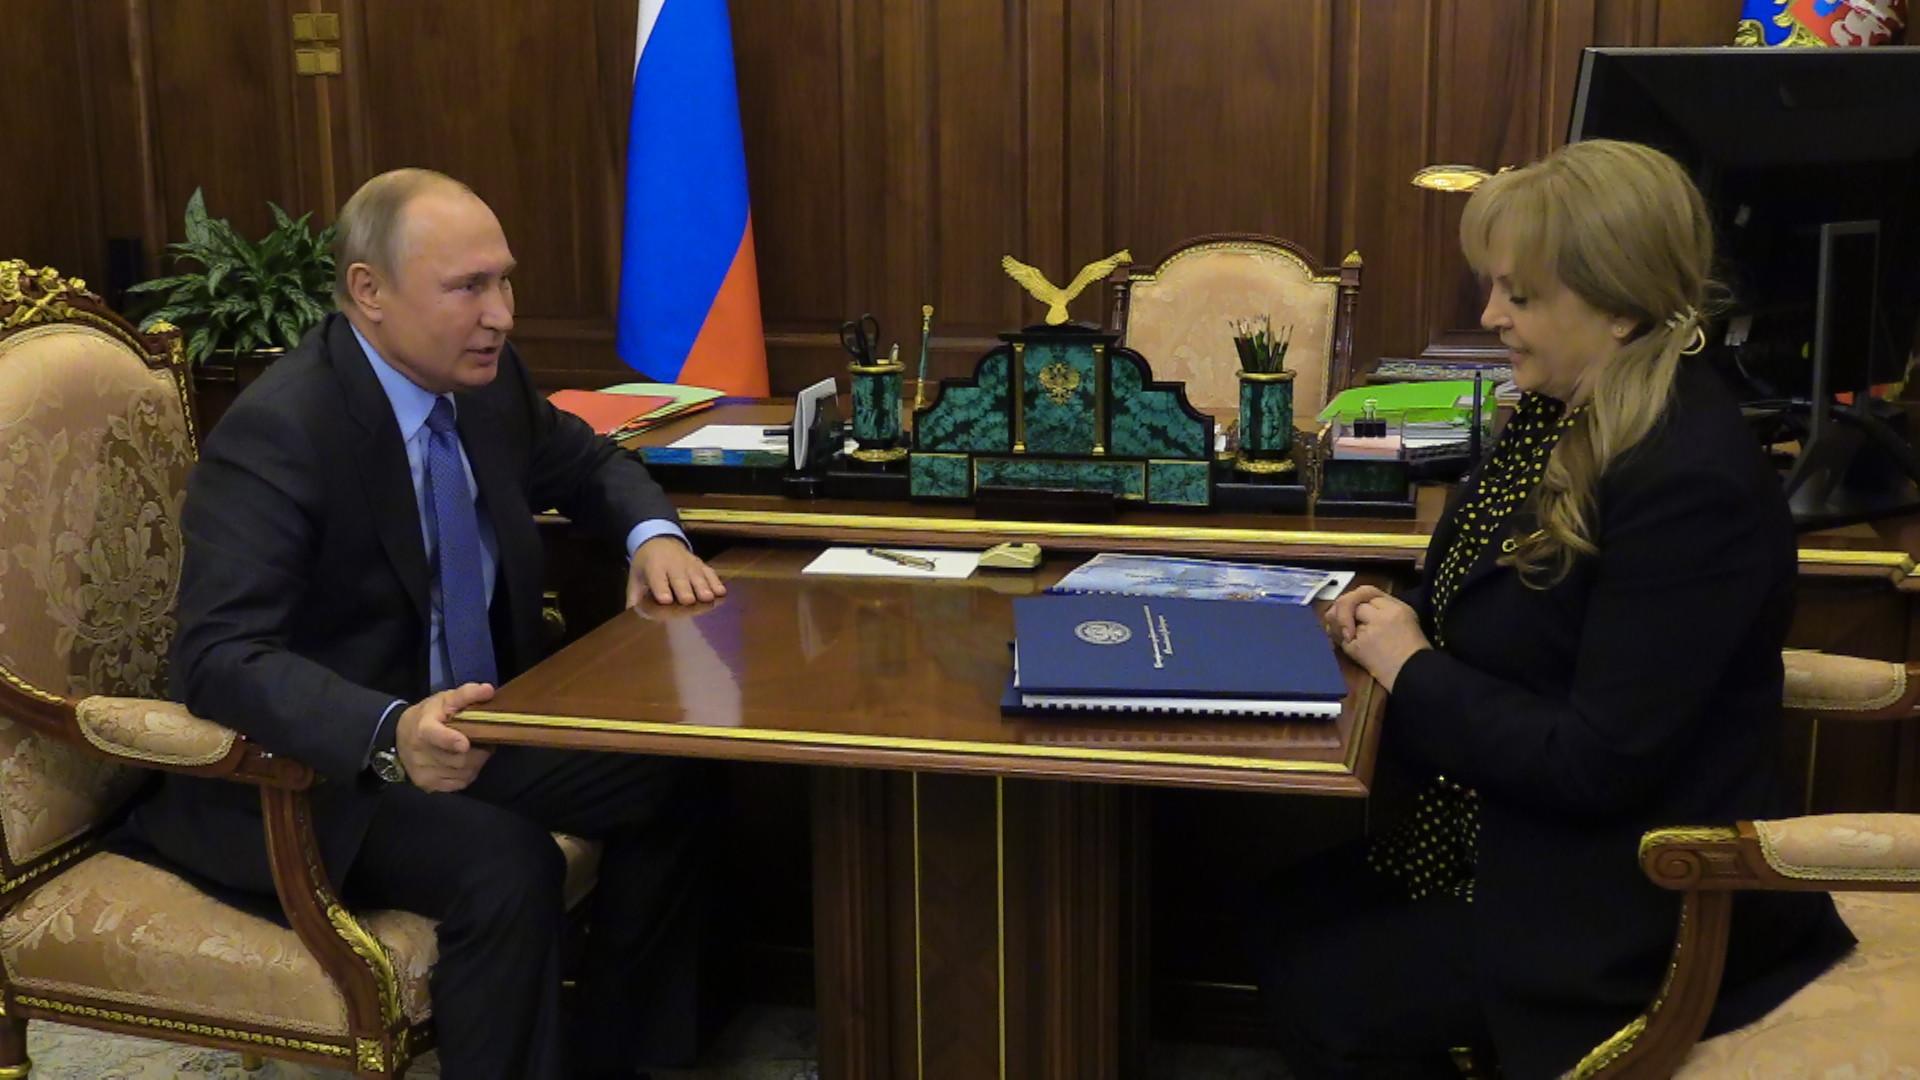 <p>Президент России Владимир Путин и председатель ЦИК РФ Элла Памфилова. Фото © LIFE</p>